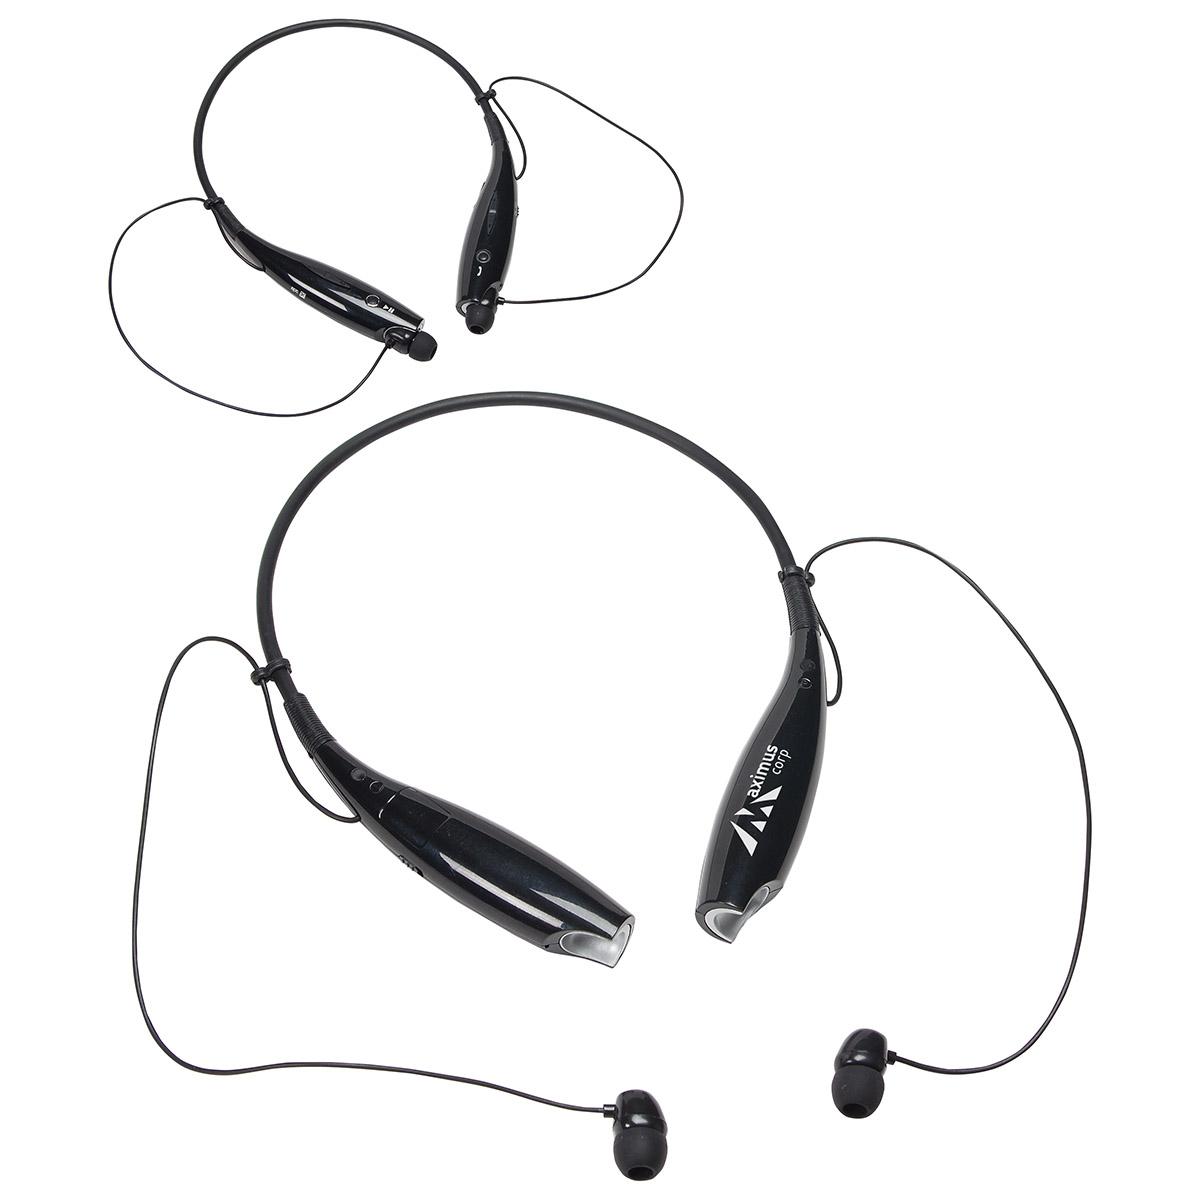 Easy Flex Wireless Headset, ETV-EF17 - 1 Colour Imprint